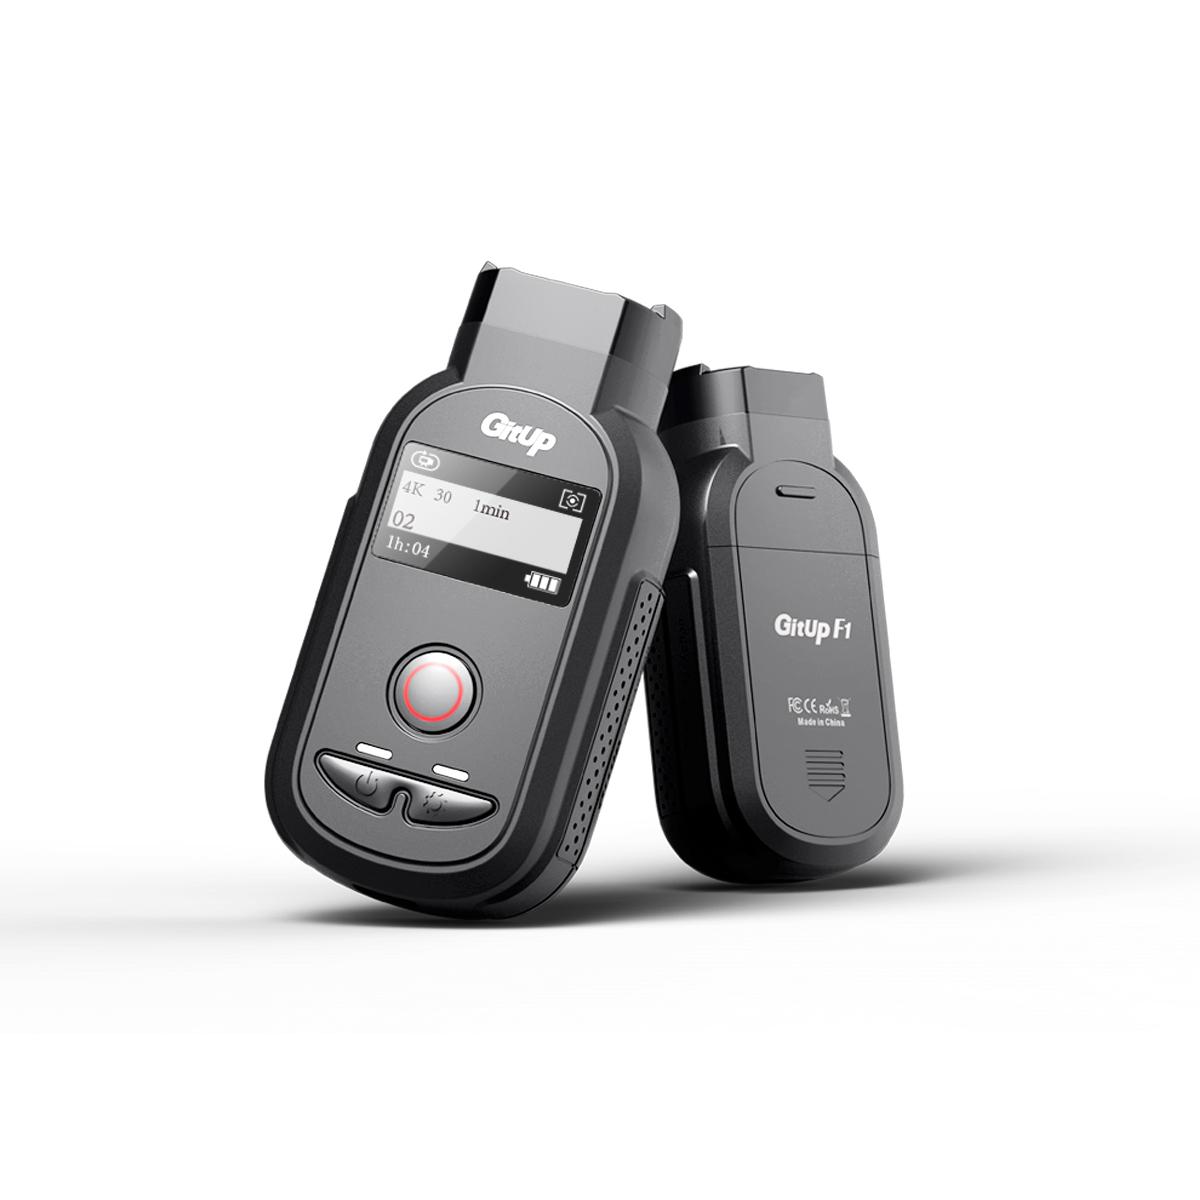 цена на X-Try XTC F1 G 4K GitUp UltraHD 4K компактная цифровая экшн-камера